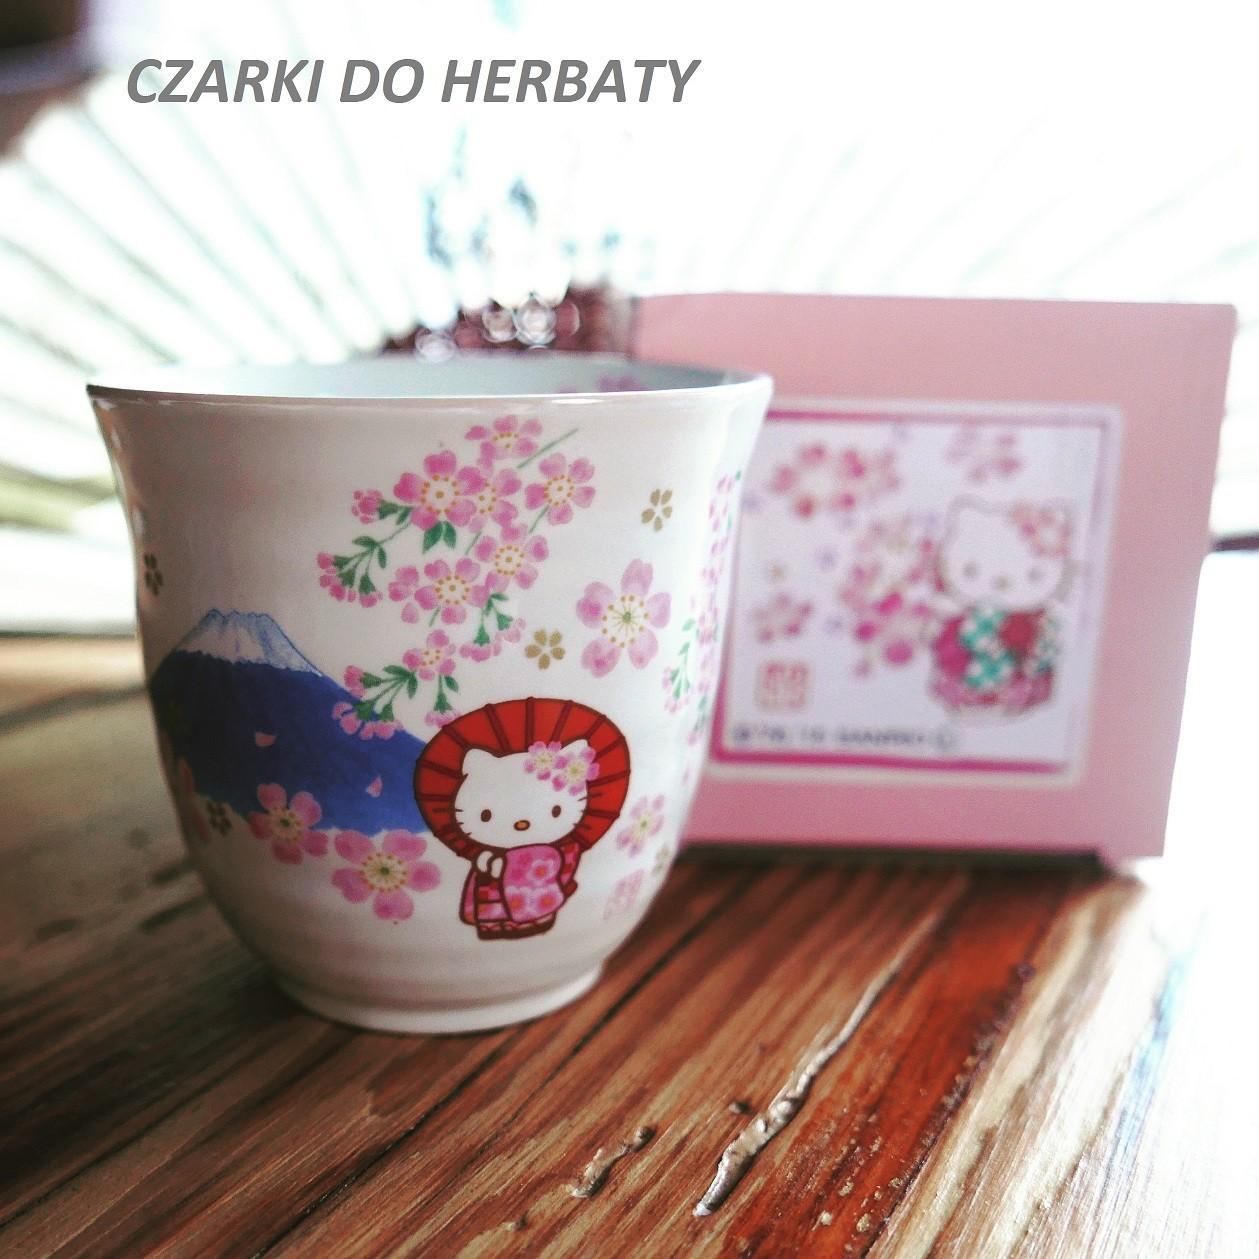 Czarki do herbaty